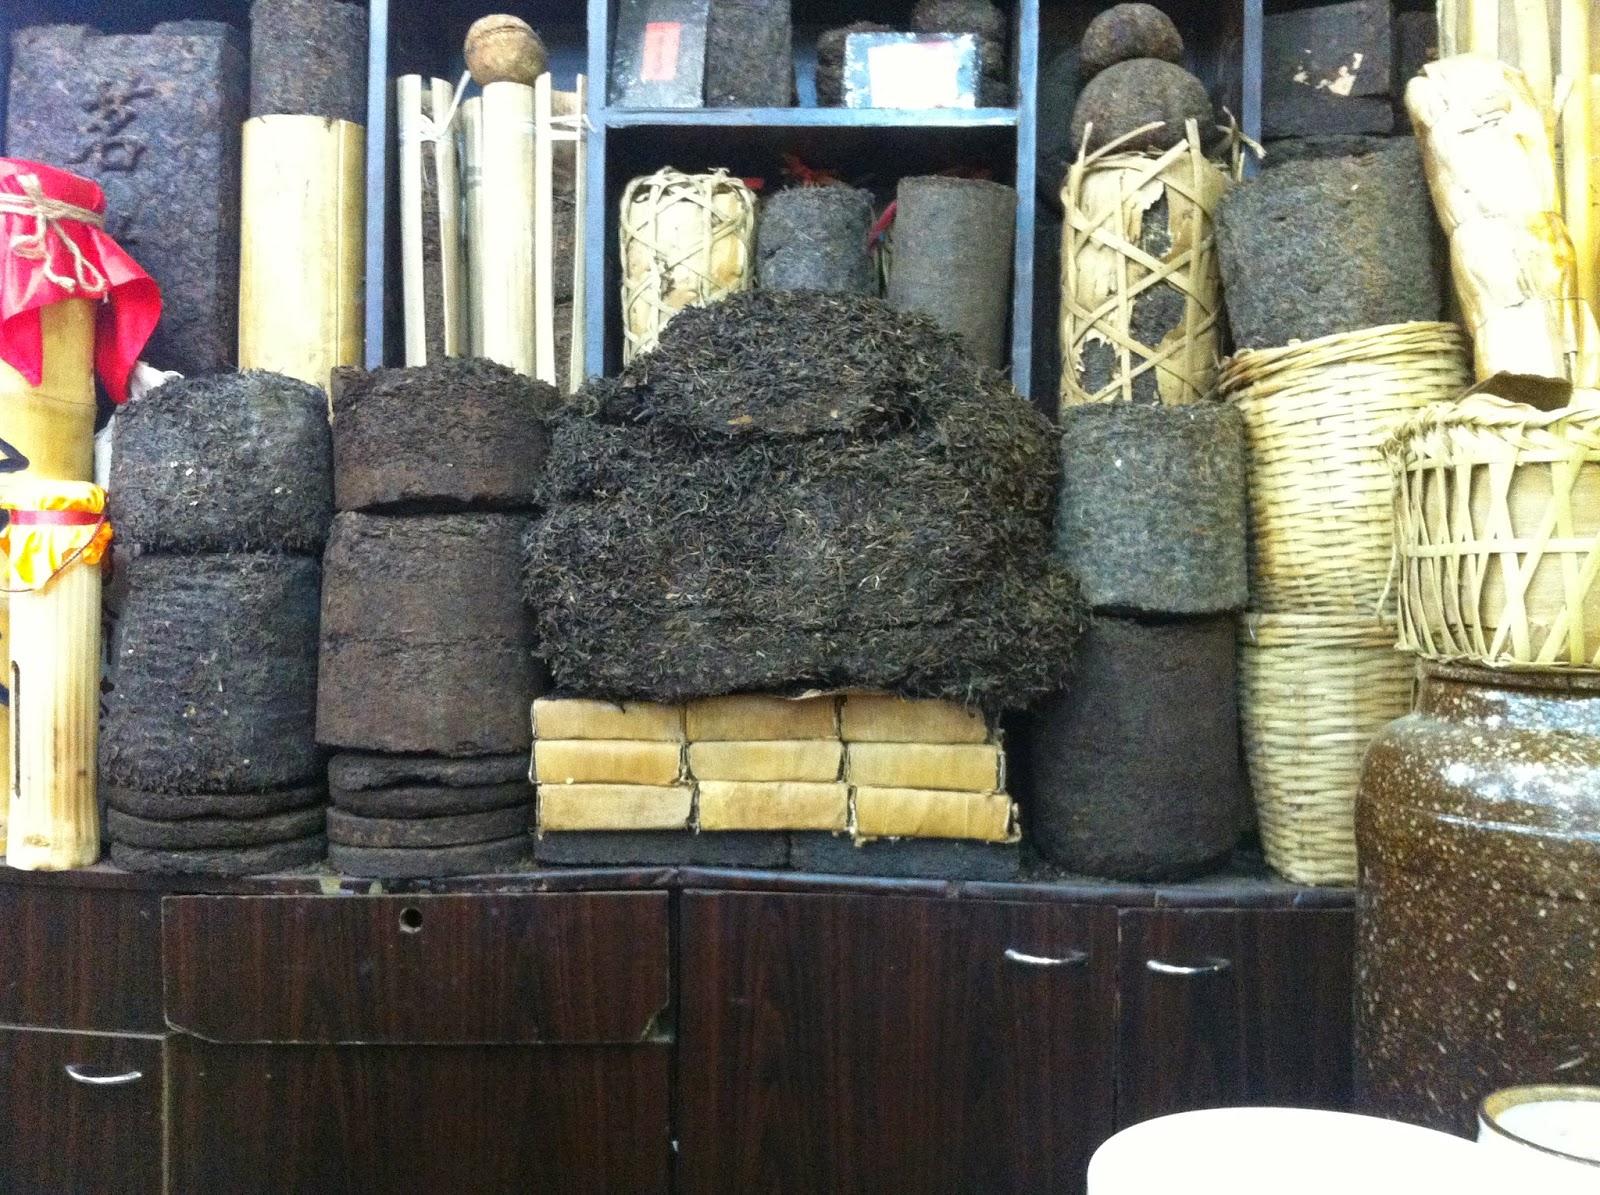 Piles and piles of Pu'er tea in Kunming, China